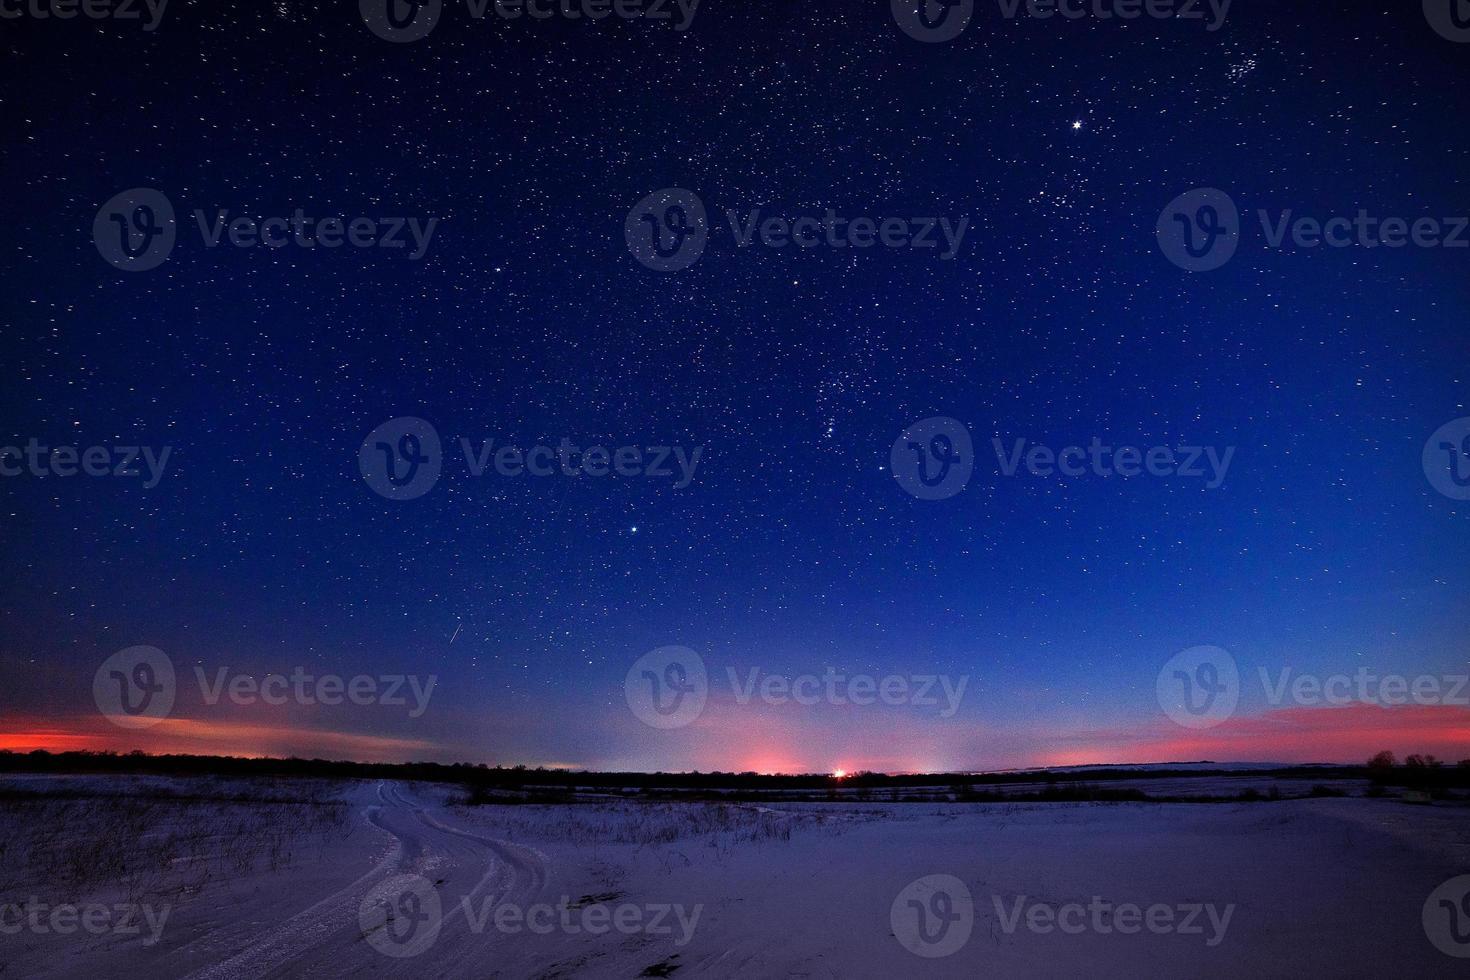 stelle nel cielo notturno foto